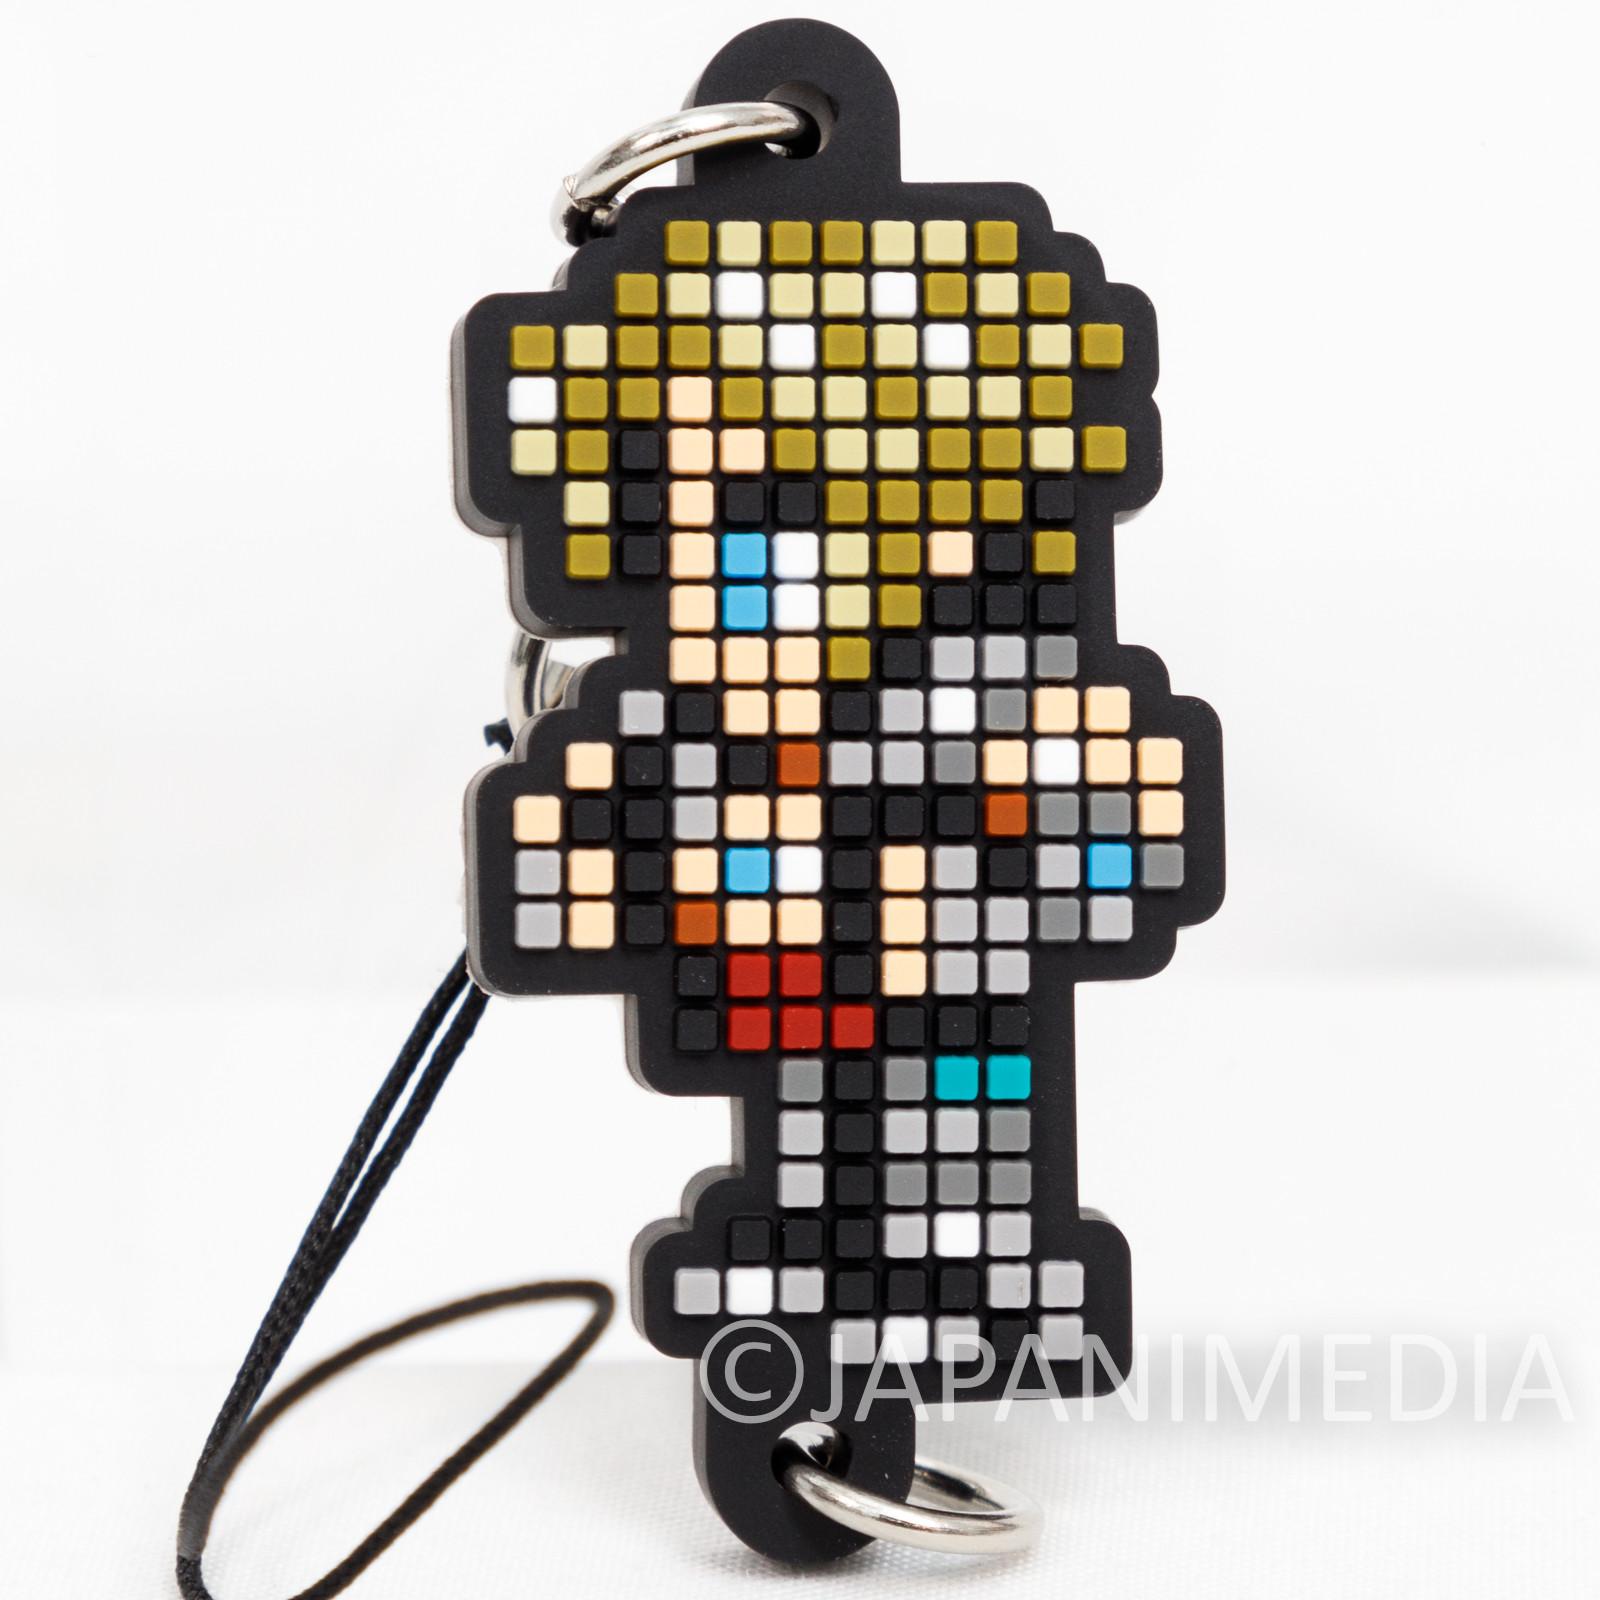 Final Fantasy Vaan Dot Design Rubber Mascot Strap Square Enix